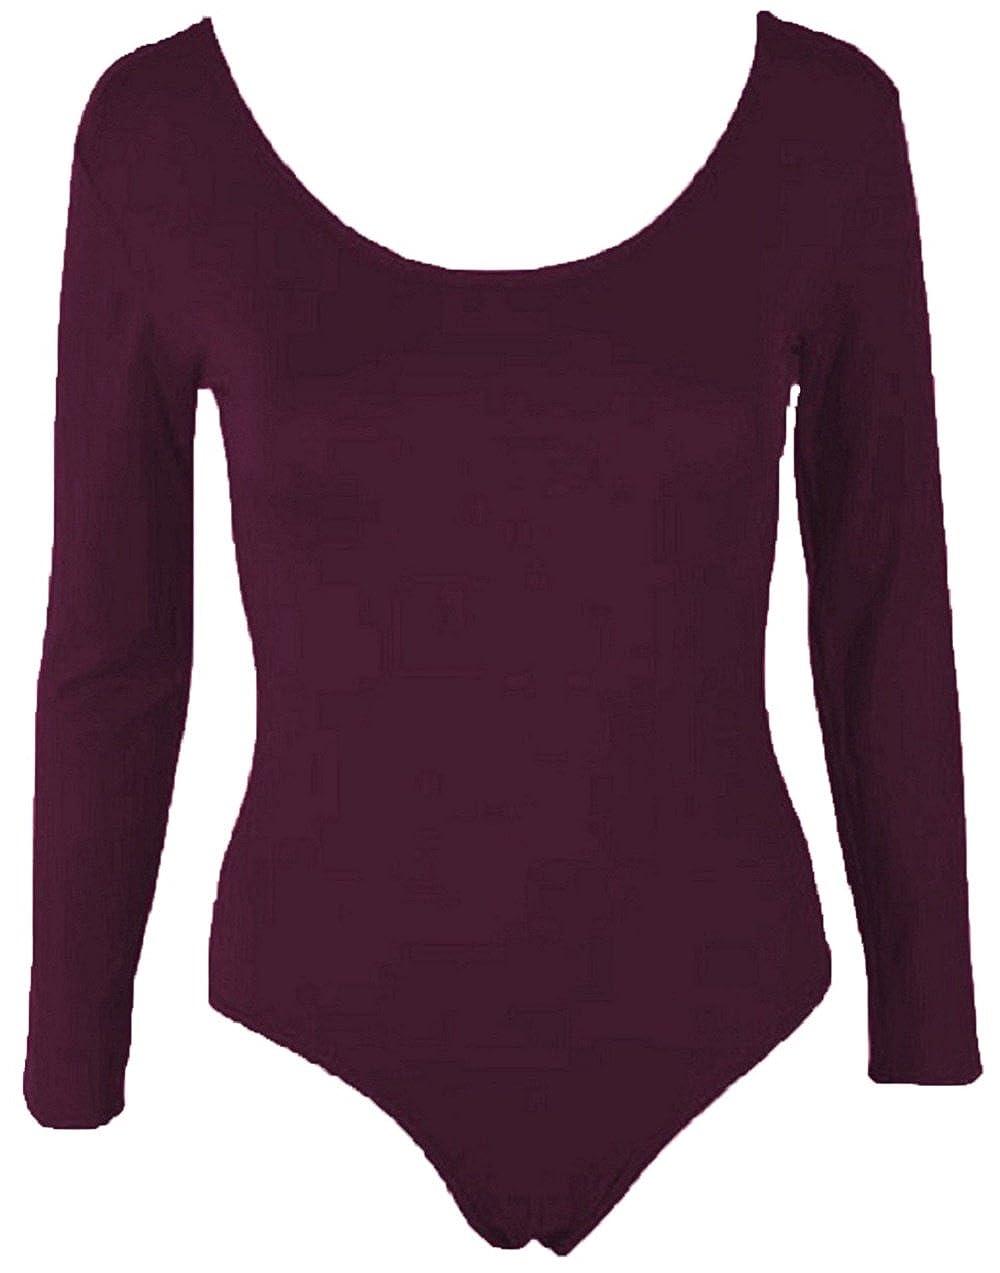 HOT HANGER Womens Long Sleeve Bodysuit Leotard Top 8-14 FB-11